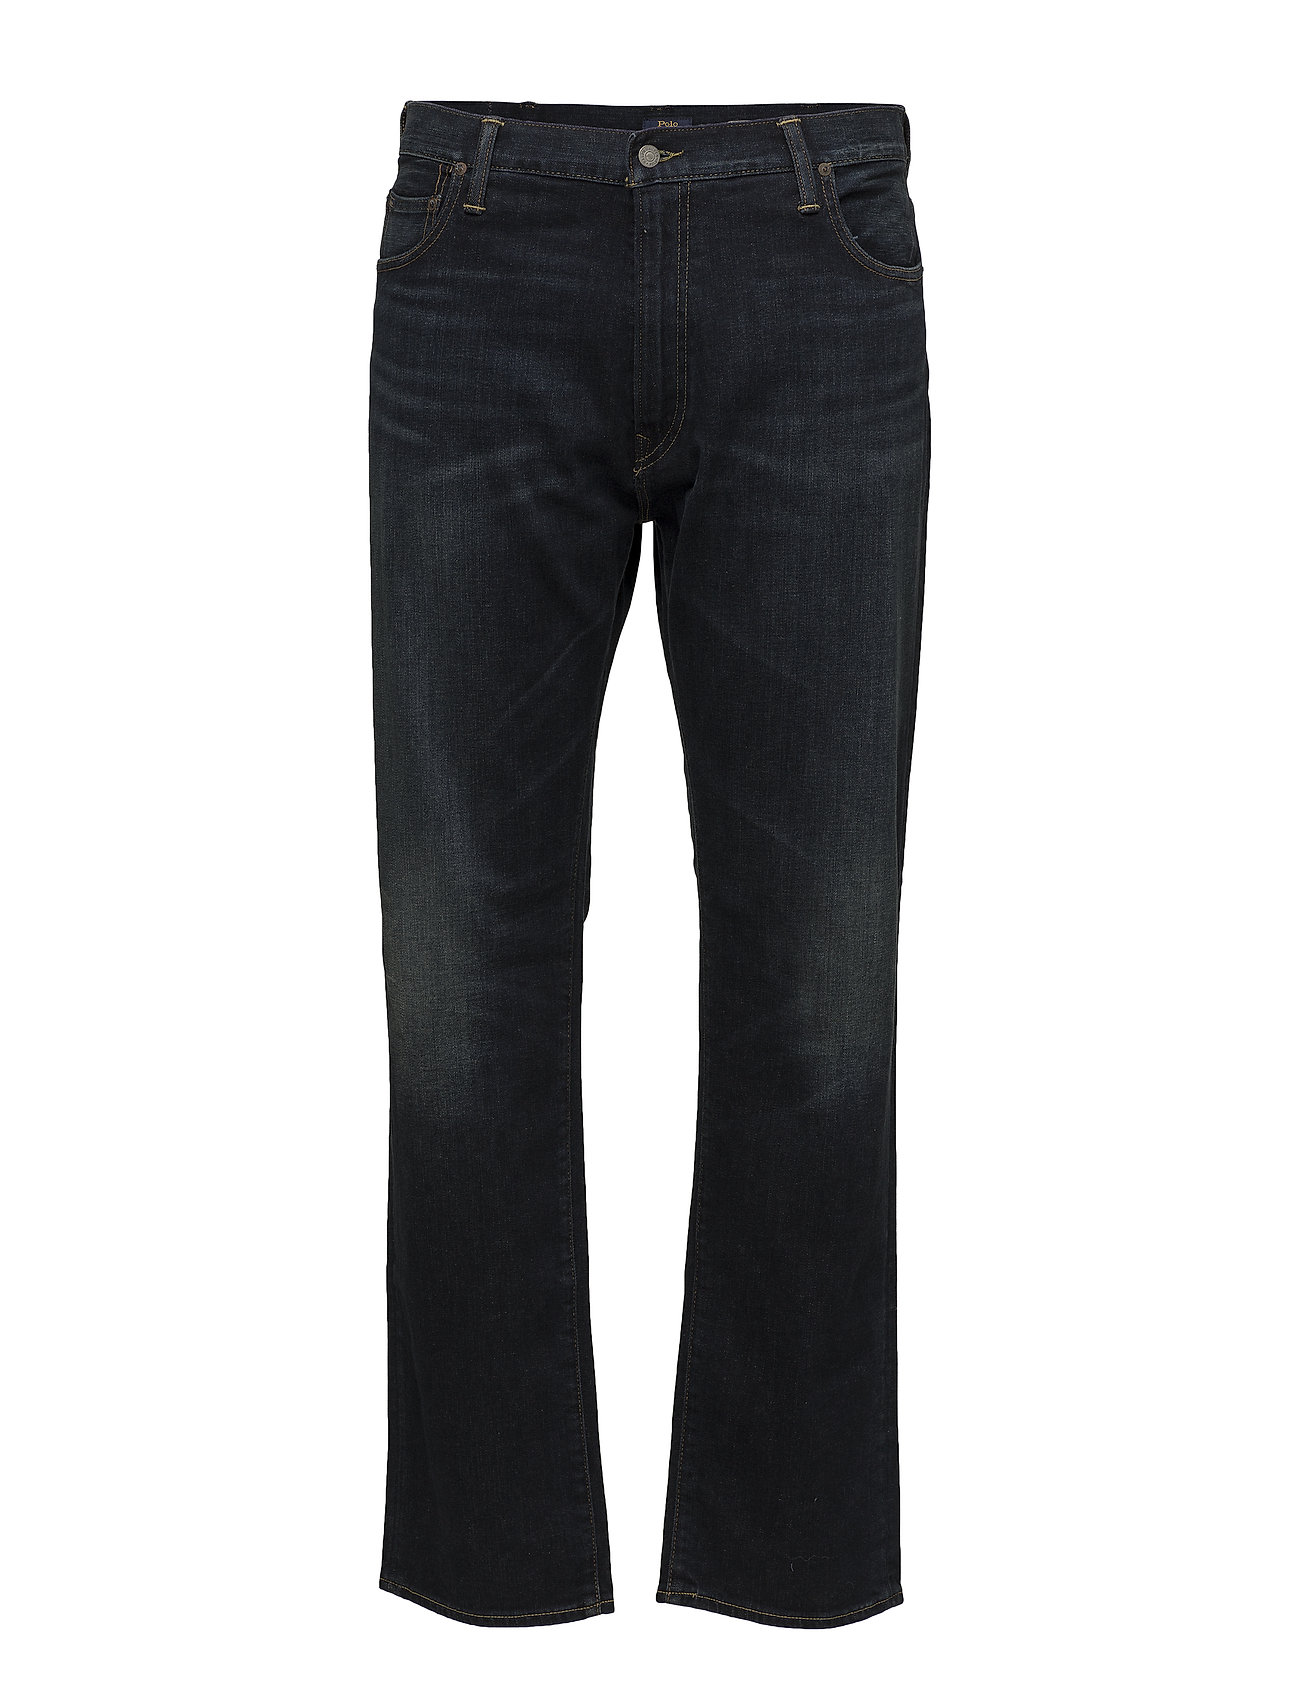 Polo Ralph Lauren Big & Tall STFHAMPTON 5 POCKET DENIM Jeans